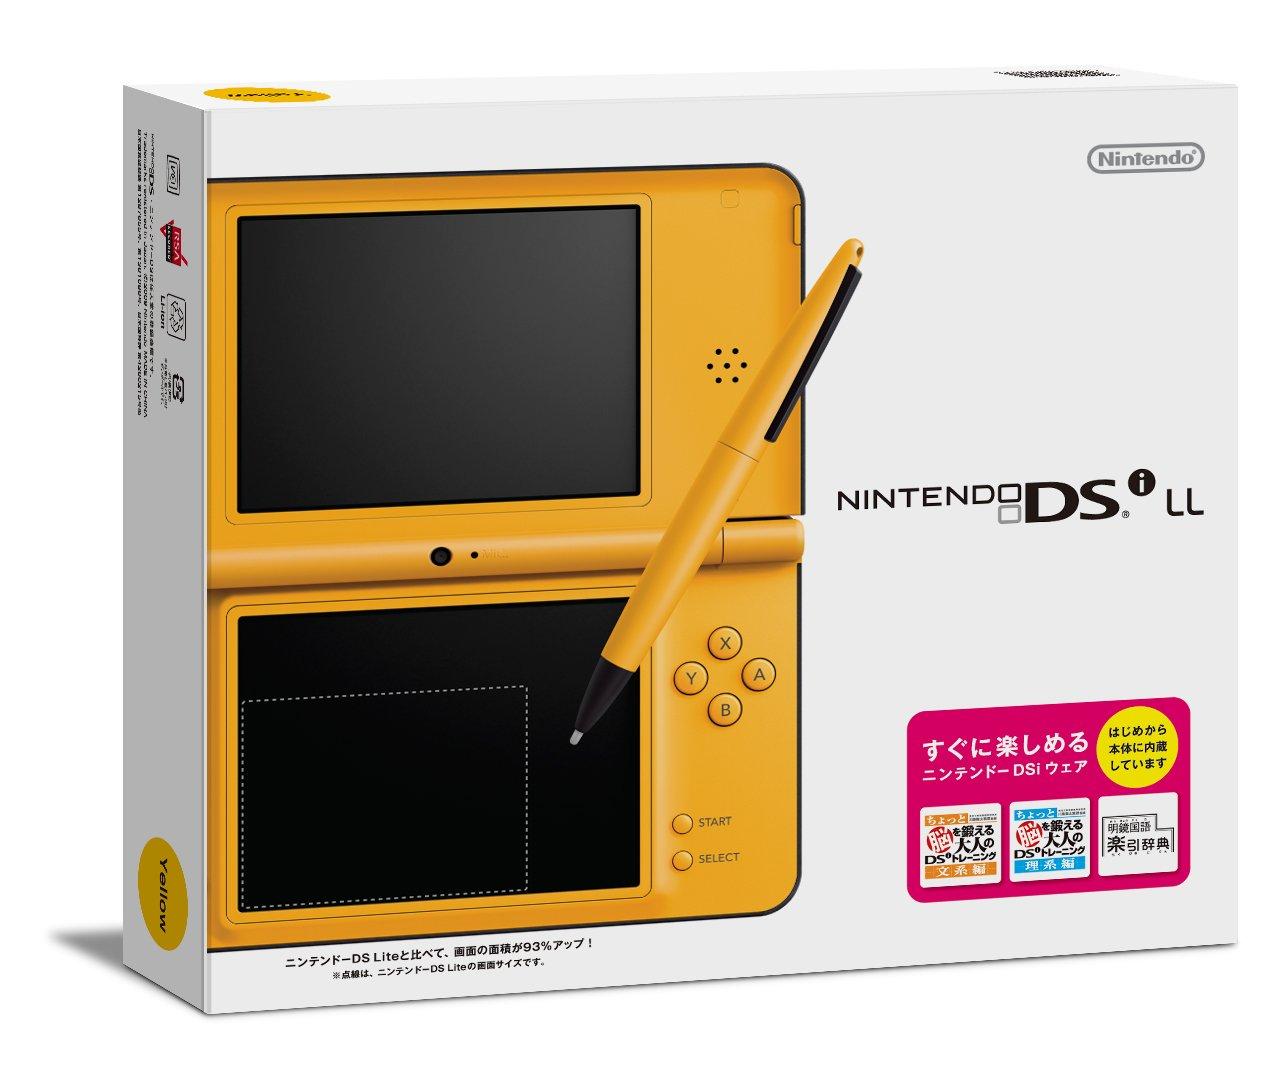 Yellow Nintendo DSi LL by Nintendo